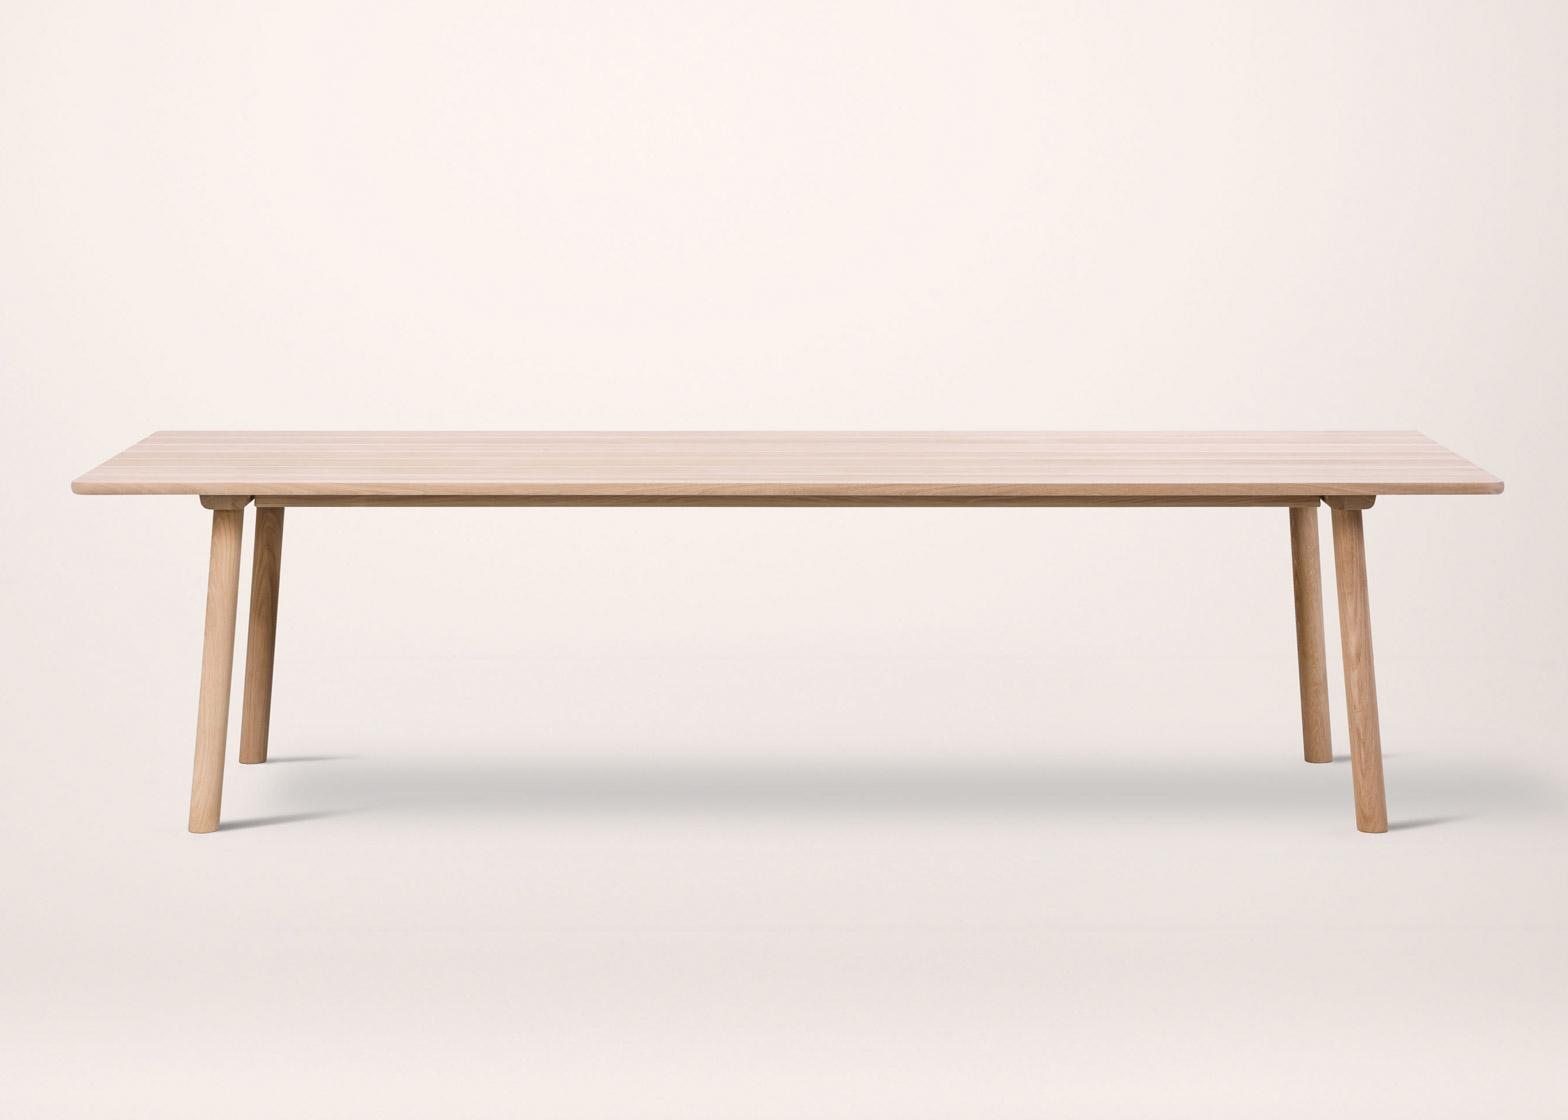 fredericia-jasper-morrison-promotion-stockholm-furniture-fair_dezeen_1568_7.jpg